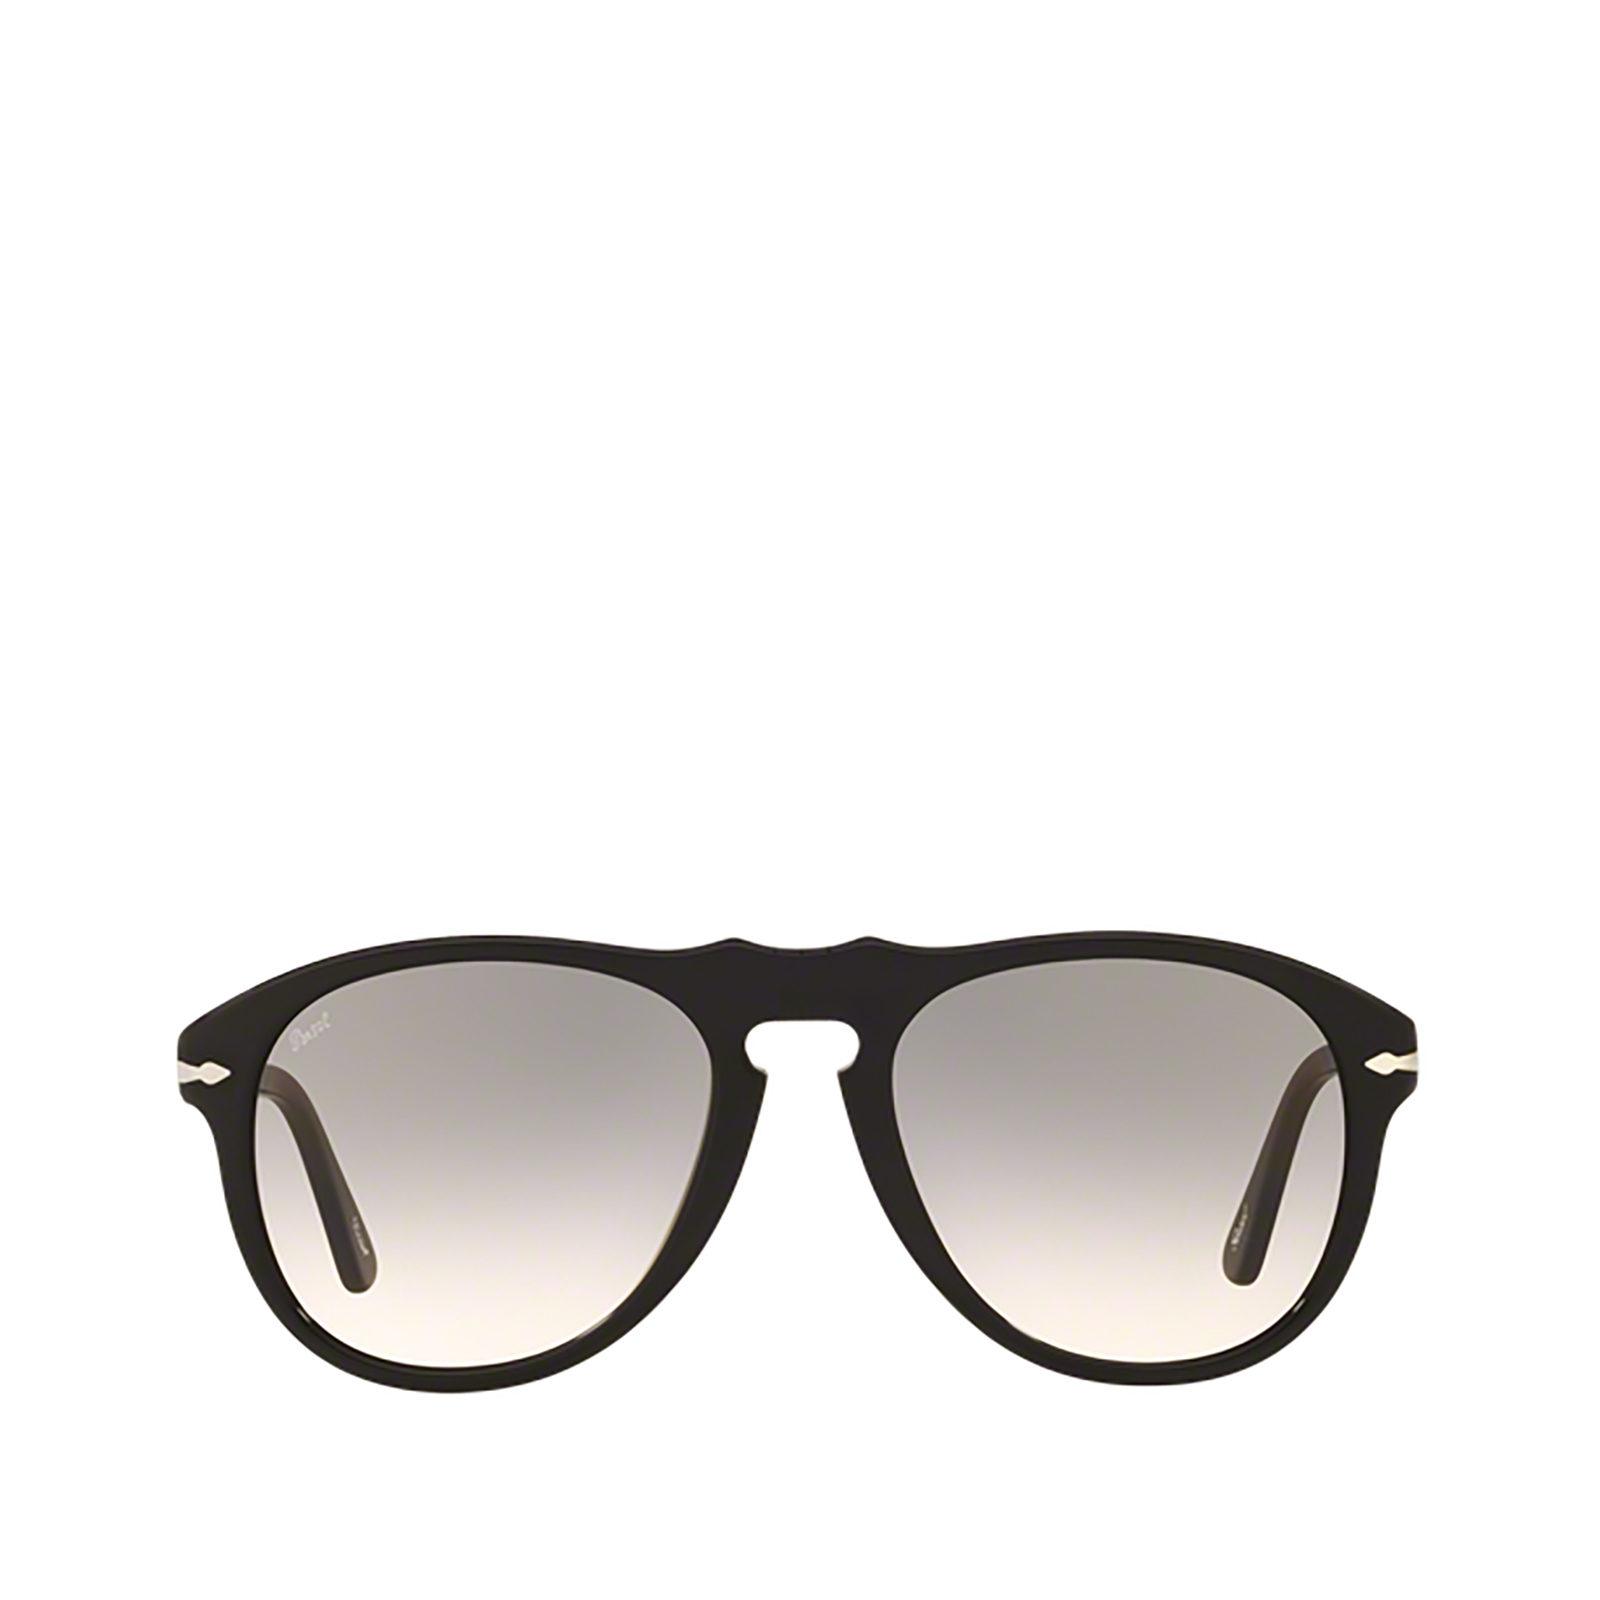 b23e42a8dc69 Persol ® PO0649 • Black - 95/32   Ottica Lipari Eyewear